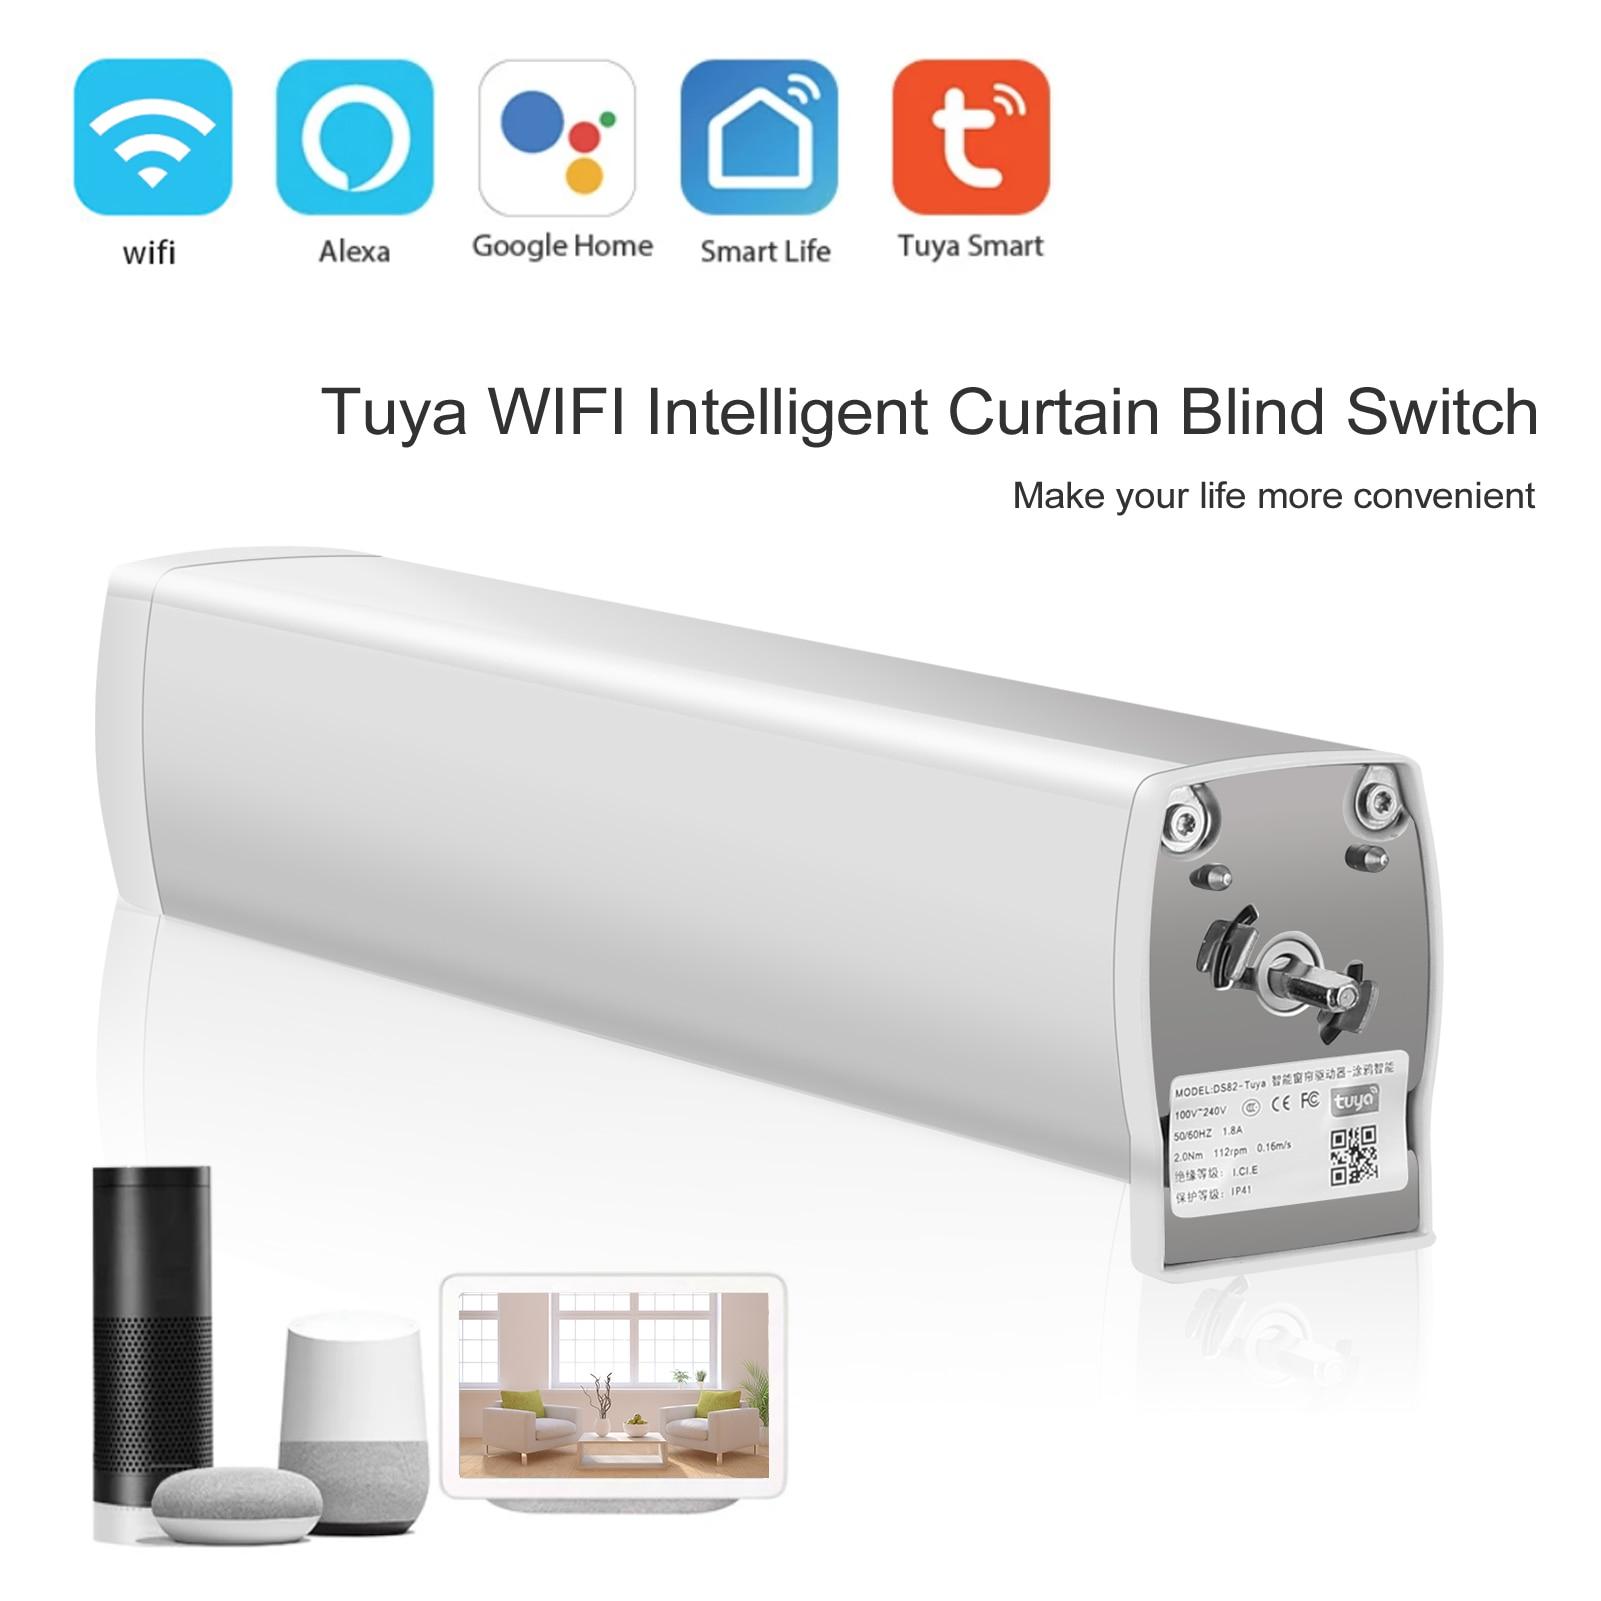 Tuya-مفتاح حائط للستائر الآلية ، جهاز تحكم عن بعد للستائر الآلية ، واي فاي